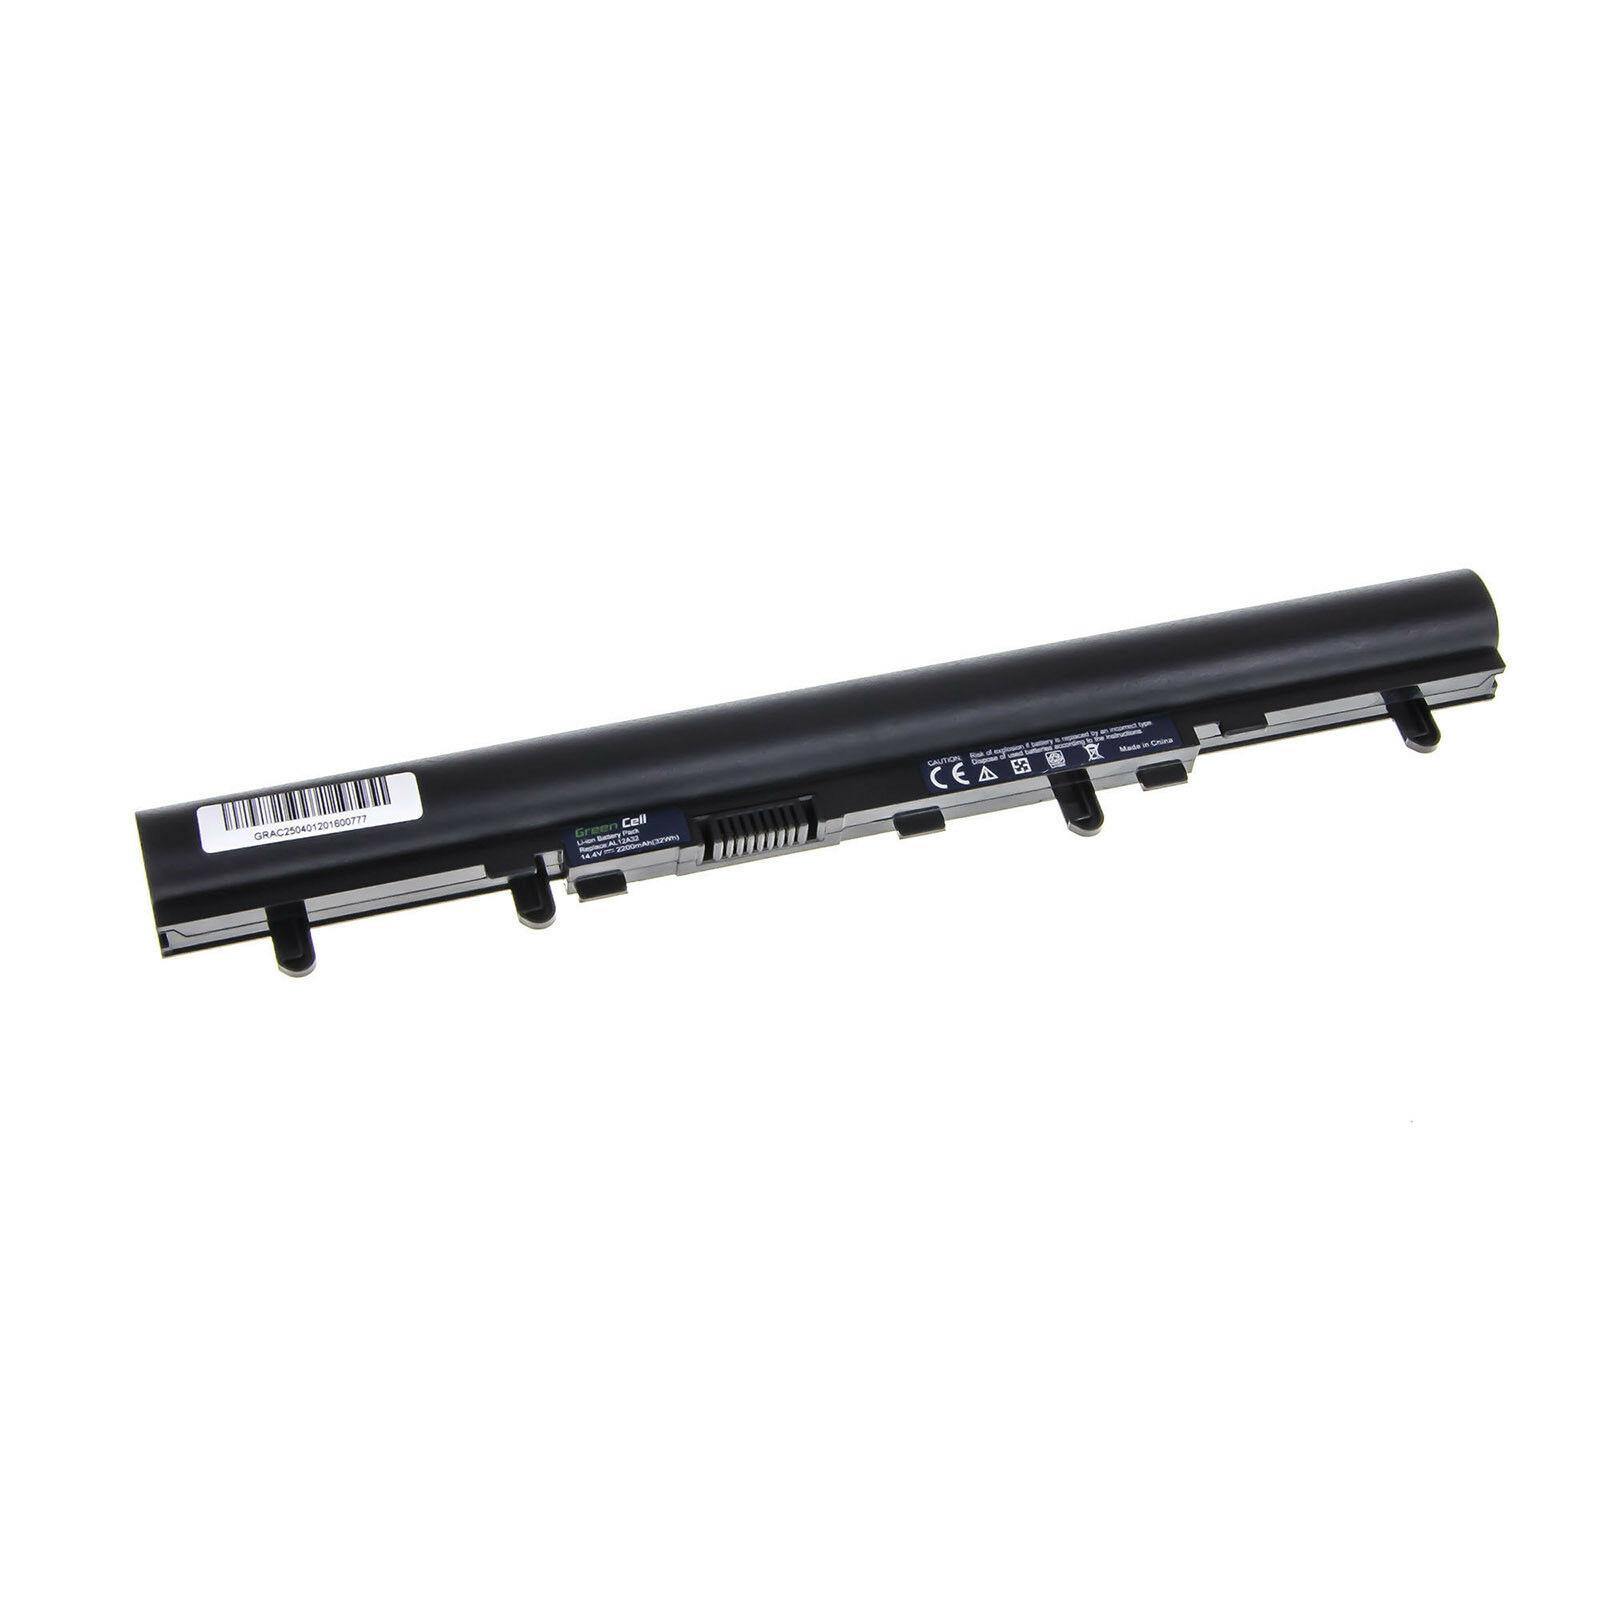 Accu voor Acer Aspire ES1-411-P2LF AL12A32(compatibele batterij)